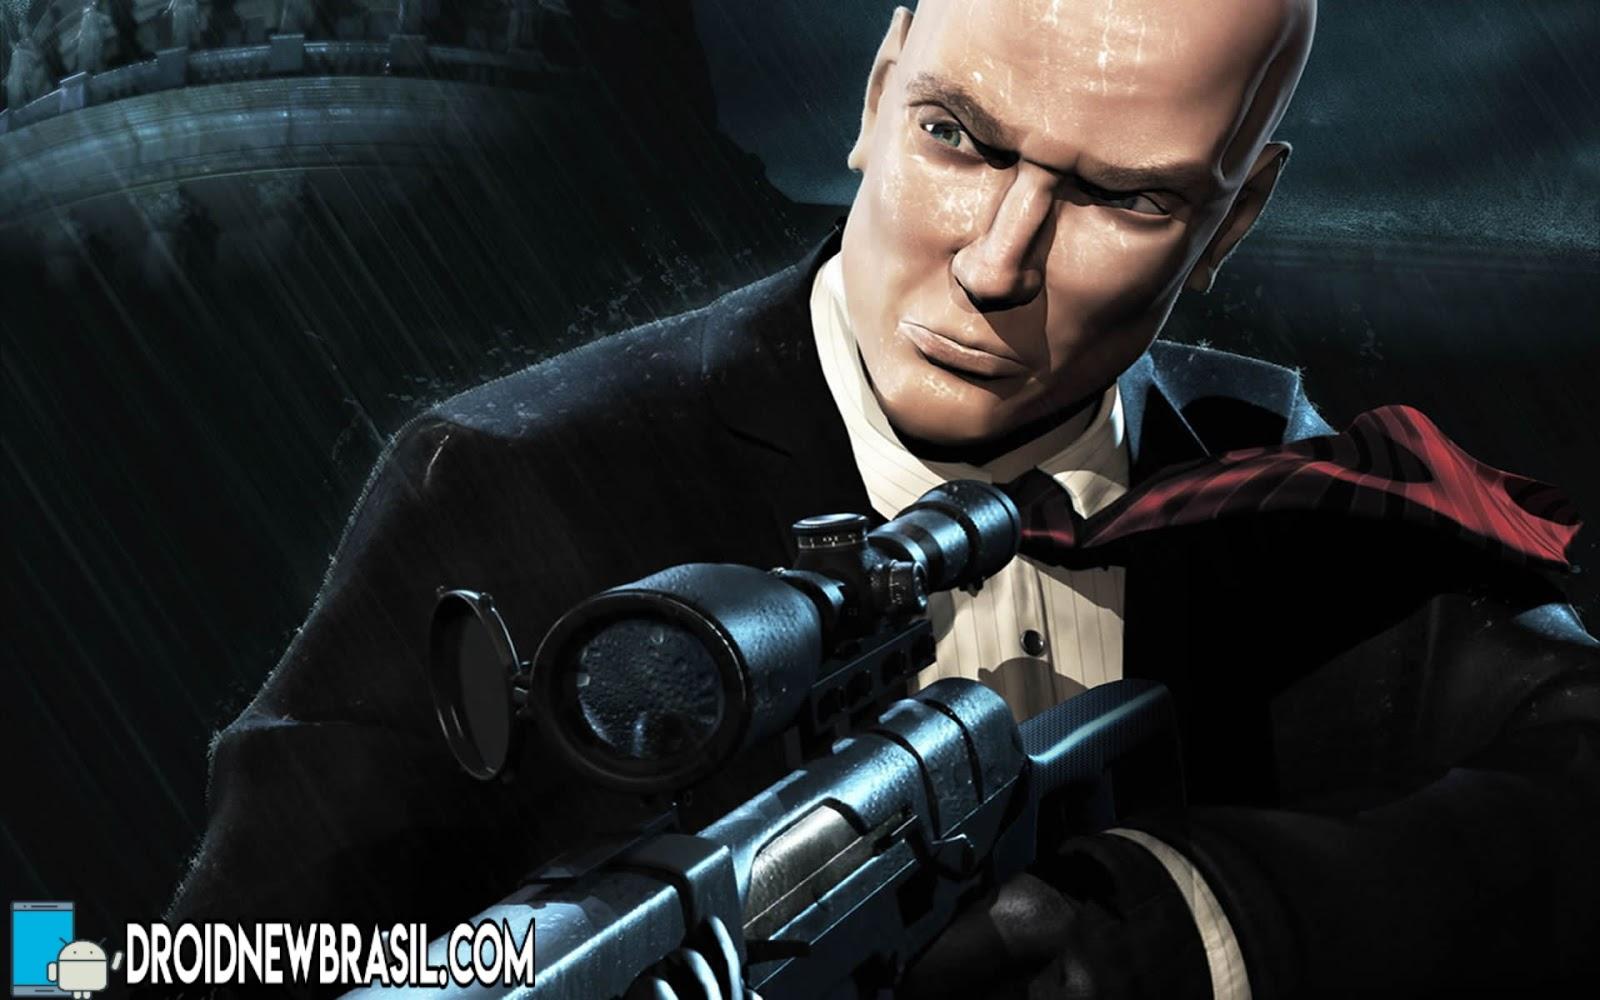 Sniper Agent: The No.47 v1.0 Apk – OBB